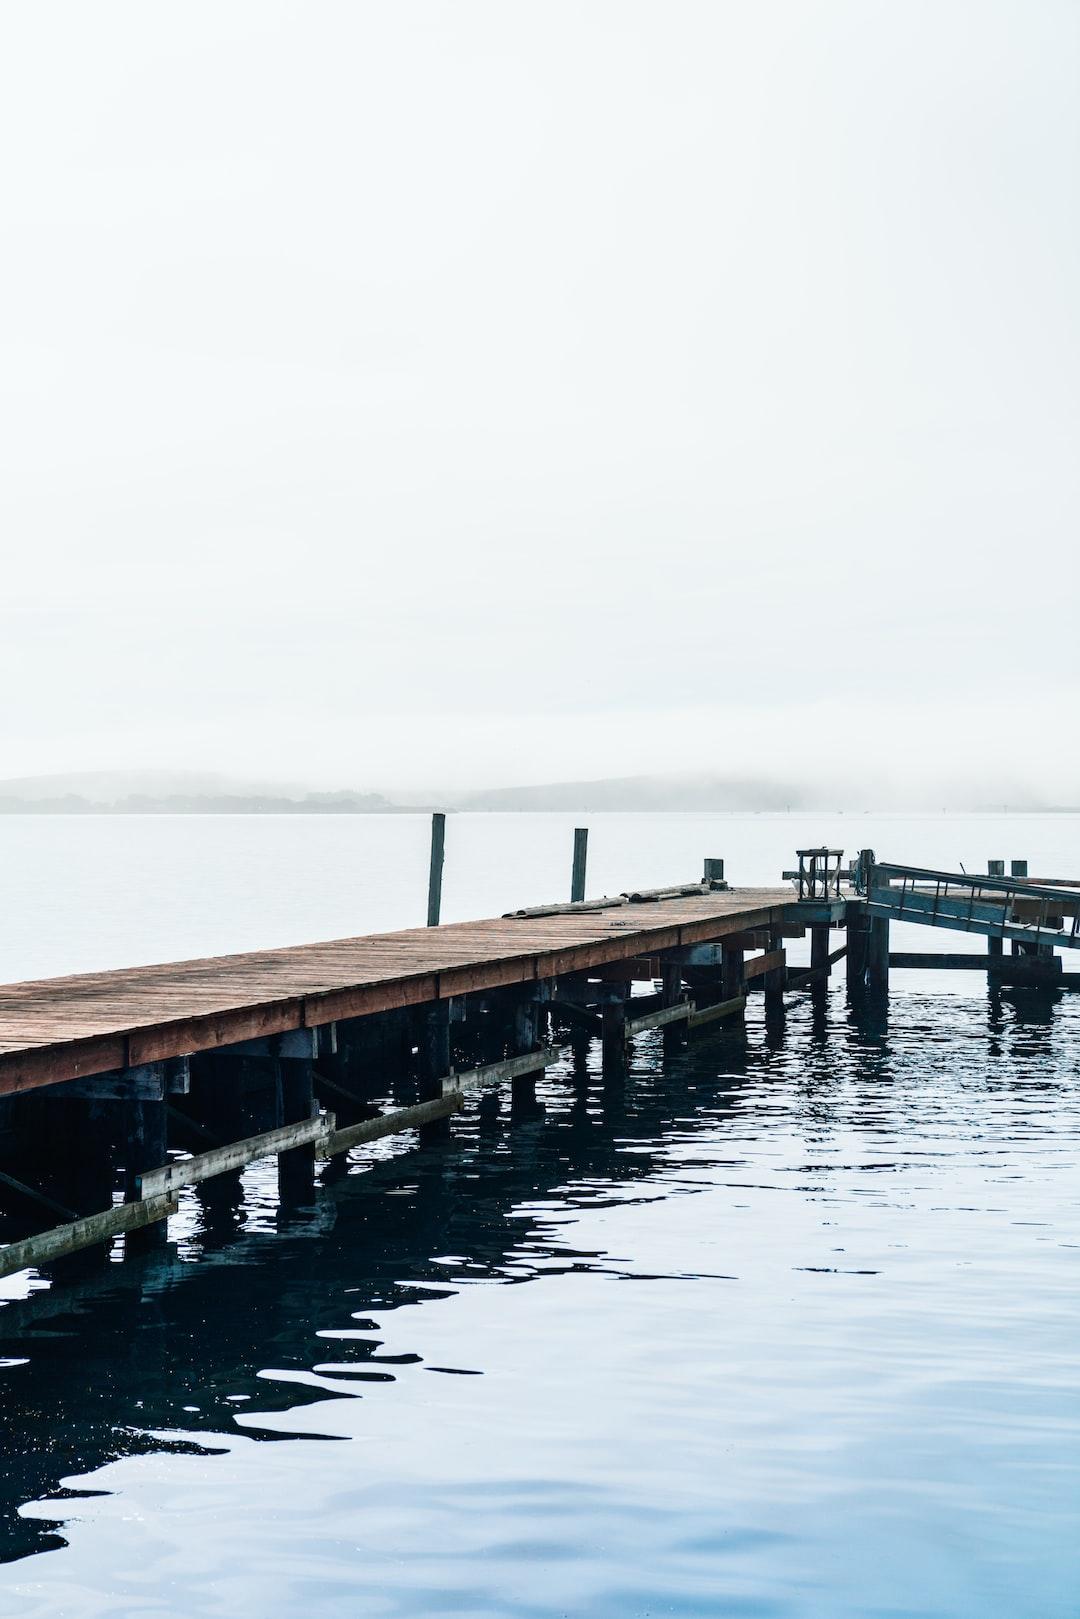 Reflections of a long wooden dock along a foggy coastline.